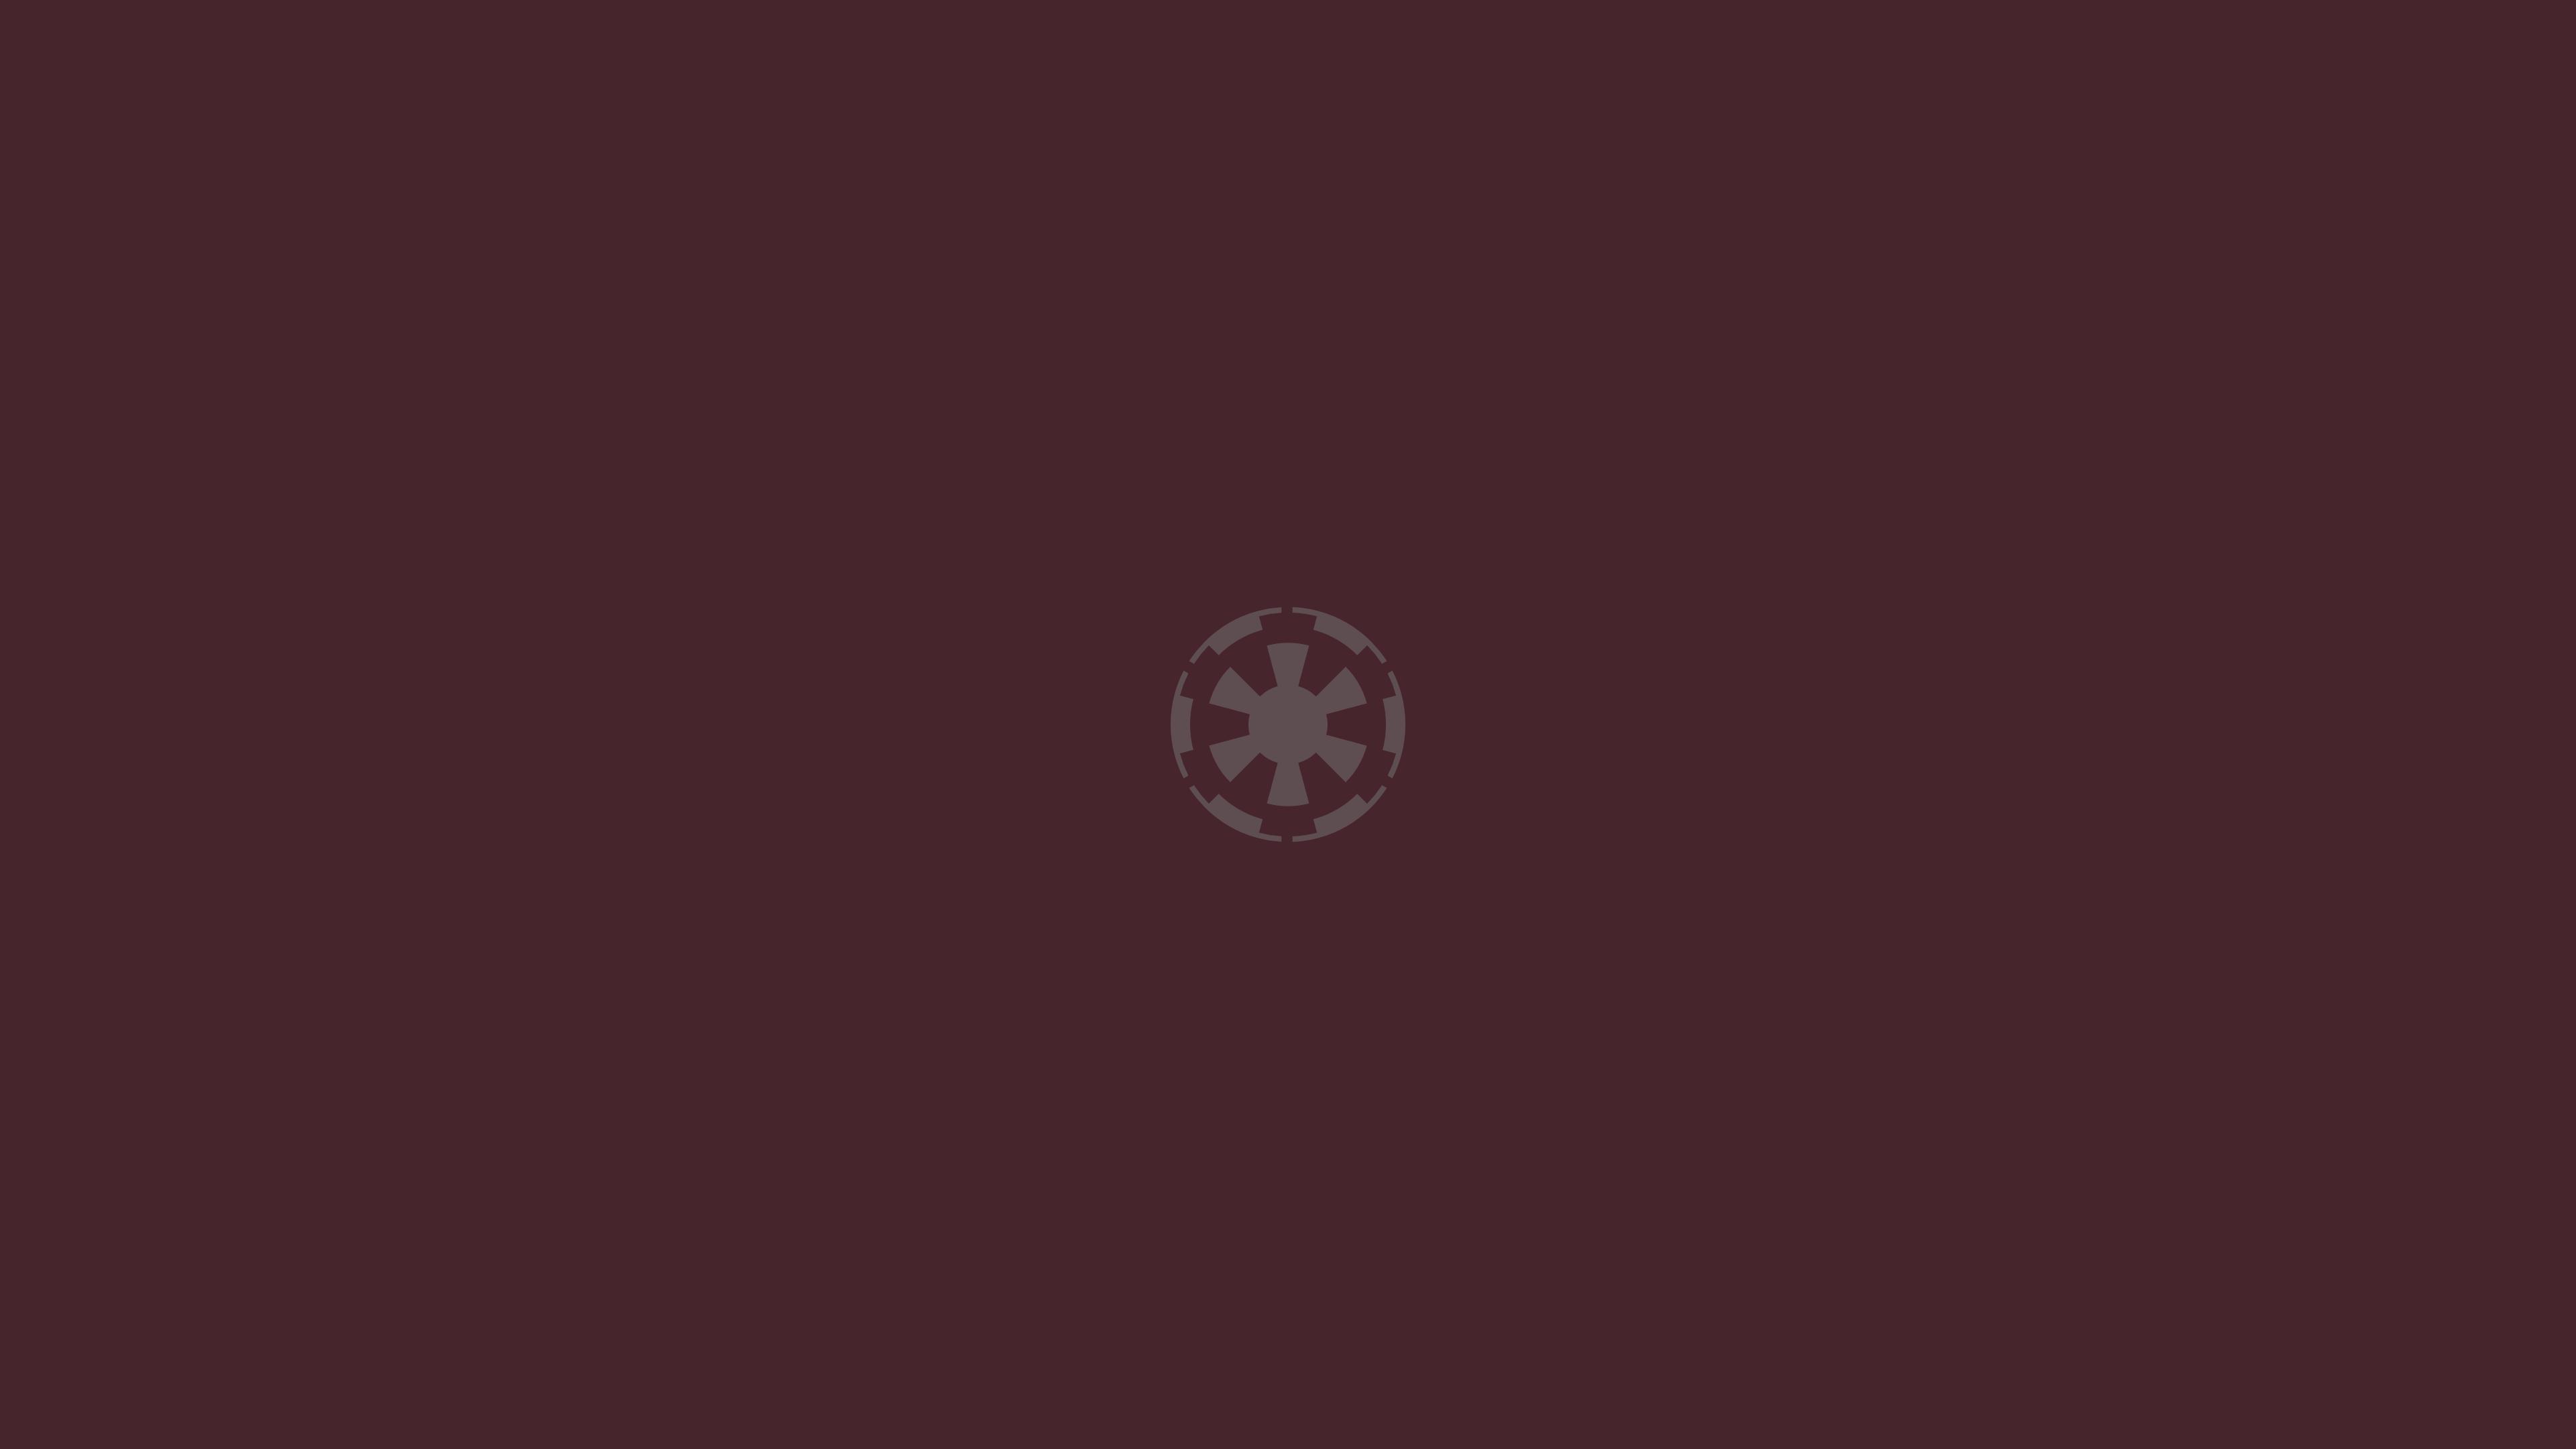 Star Wars Galactic Empire minimalism 1826819